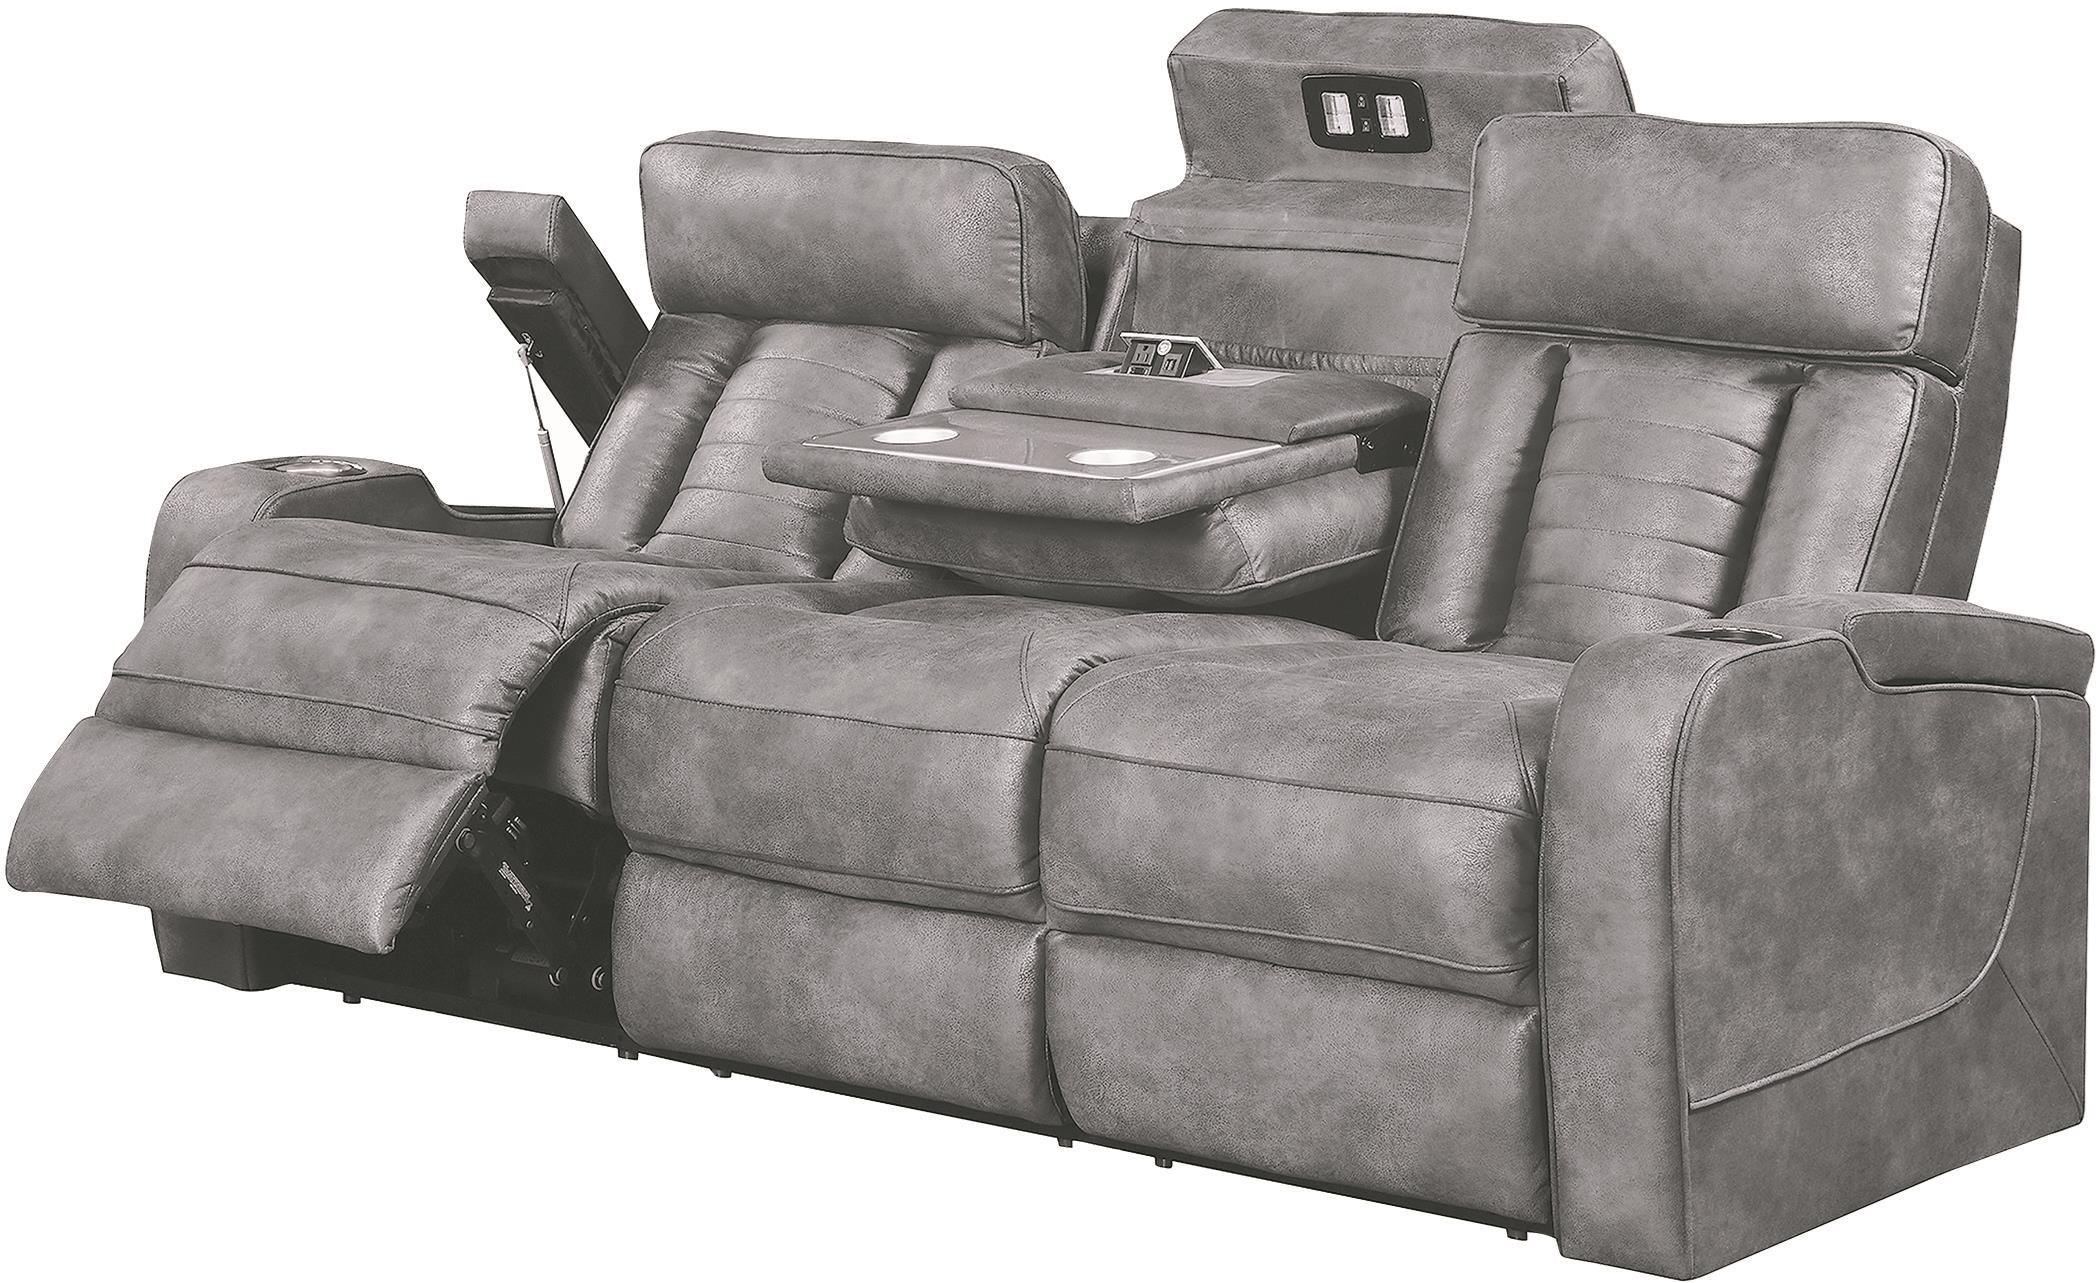 Lambor Furnishings Napa Power Reclining Sofa Darvin Furniture Sofas